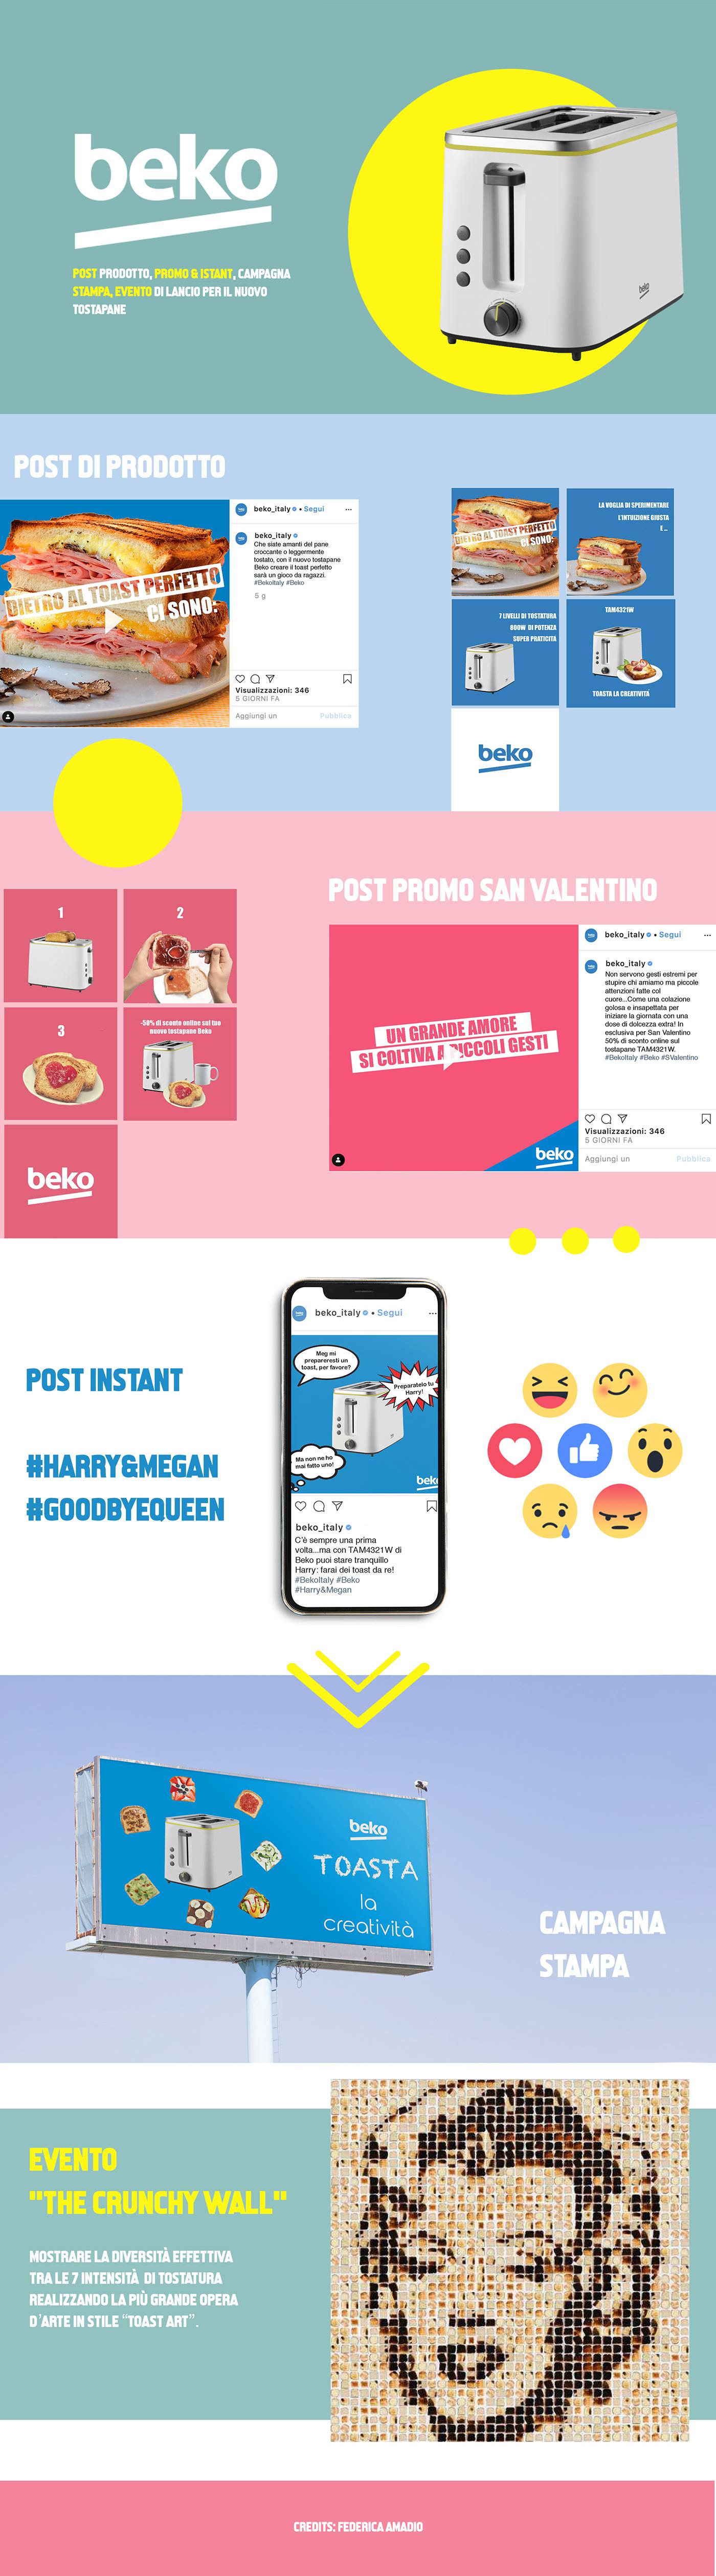 beko bekoitalia branding  copywriting  Creativity digital Event social